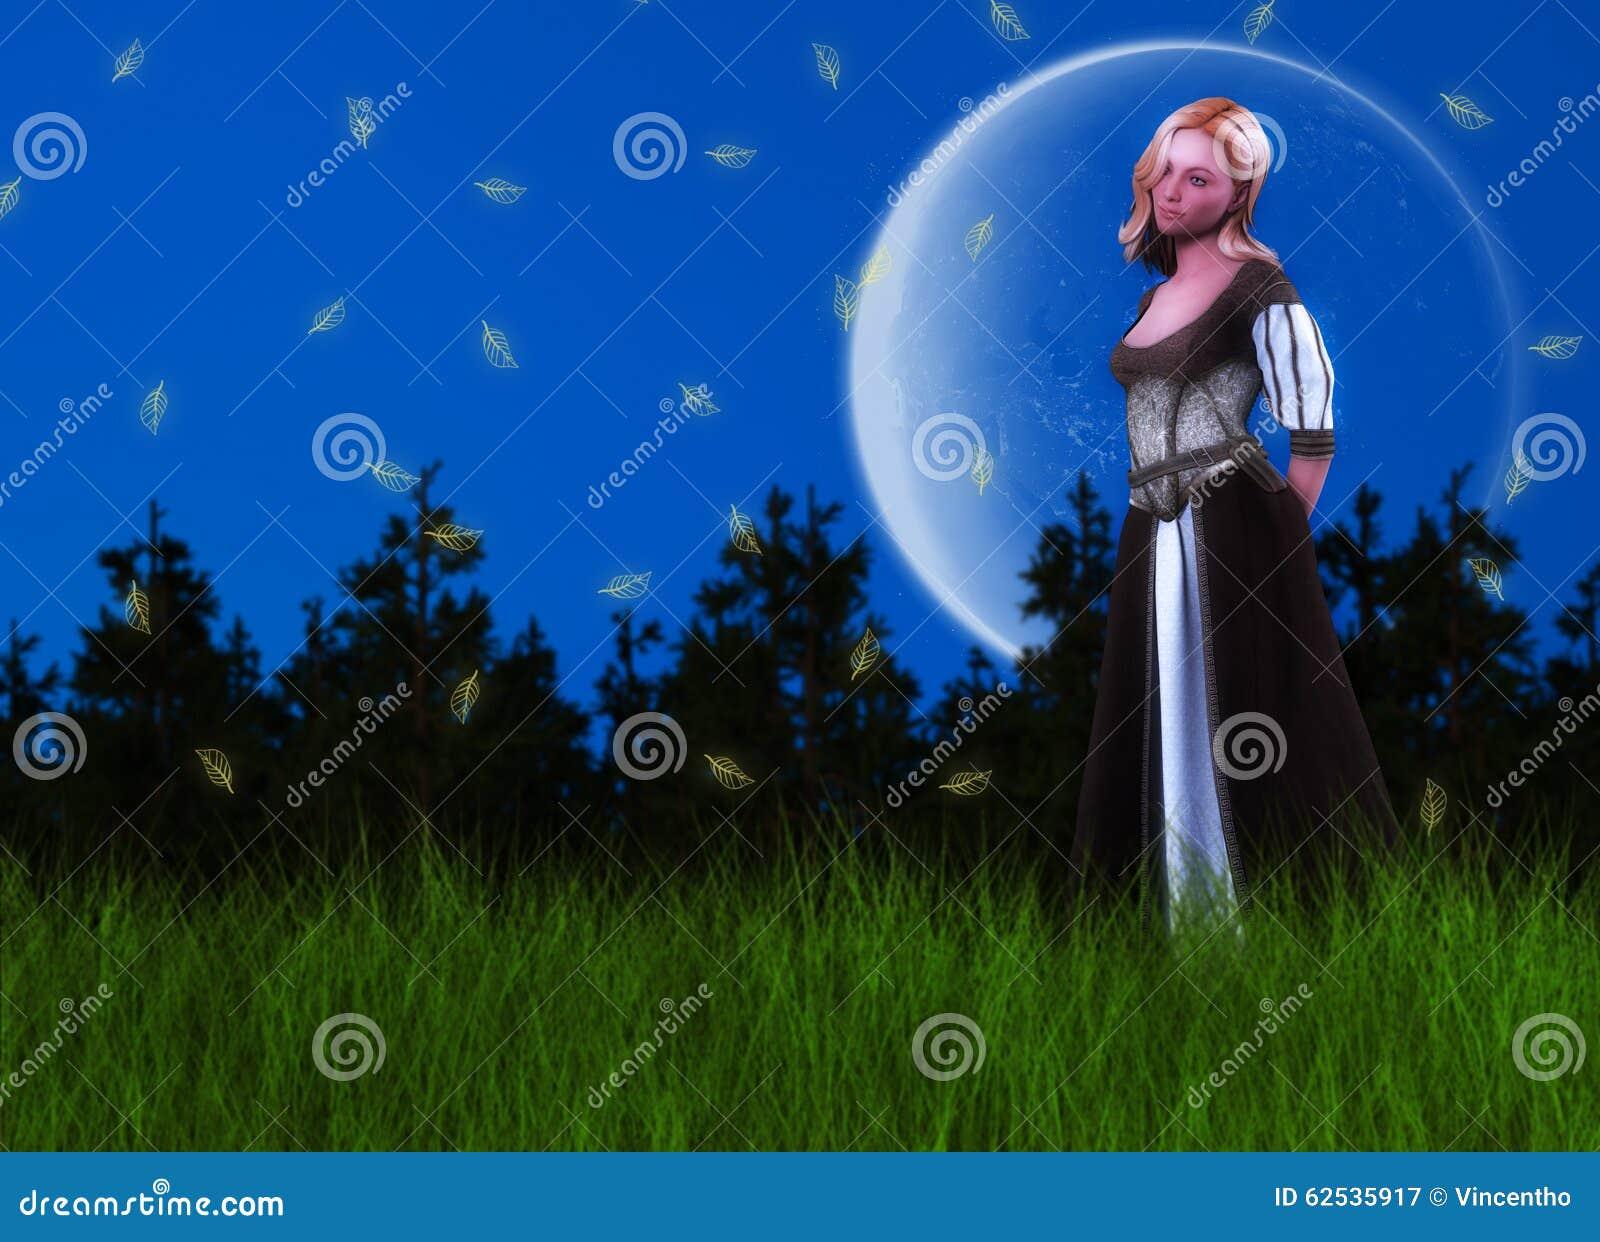 童话Dreamy Background公主